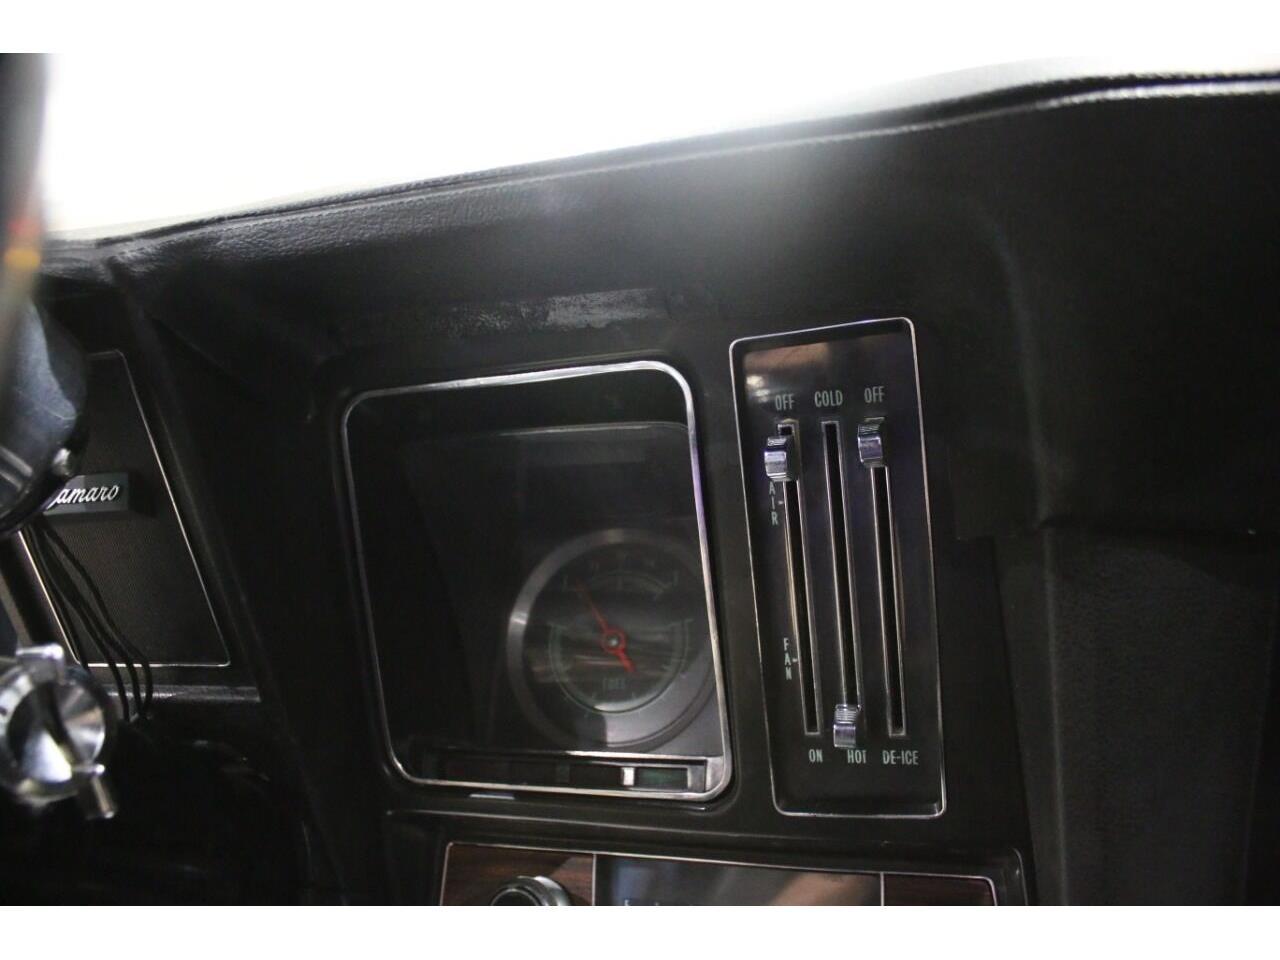 1969 Chevrolet Camaro (CC-1353233) for sale in Hilton, New York